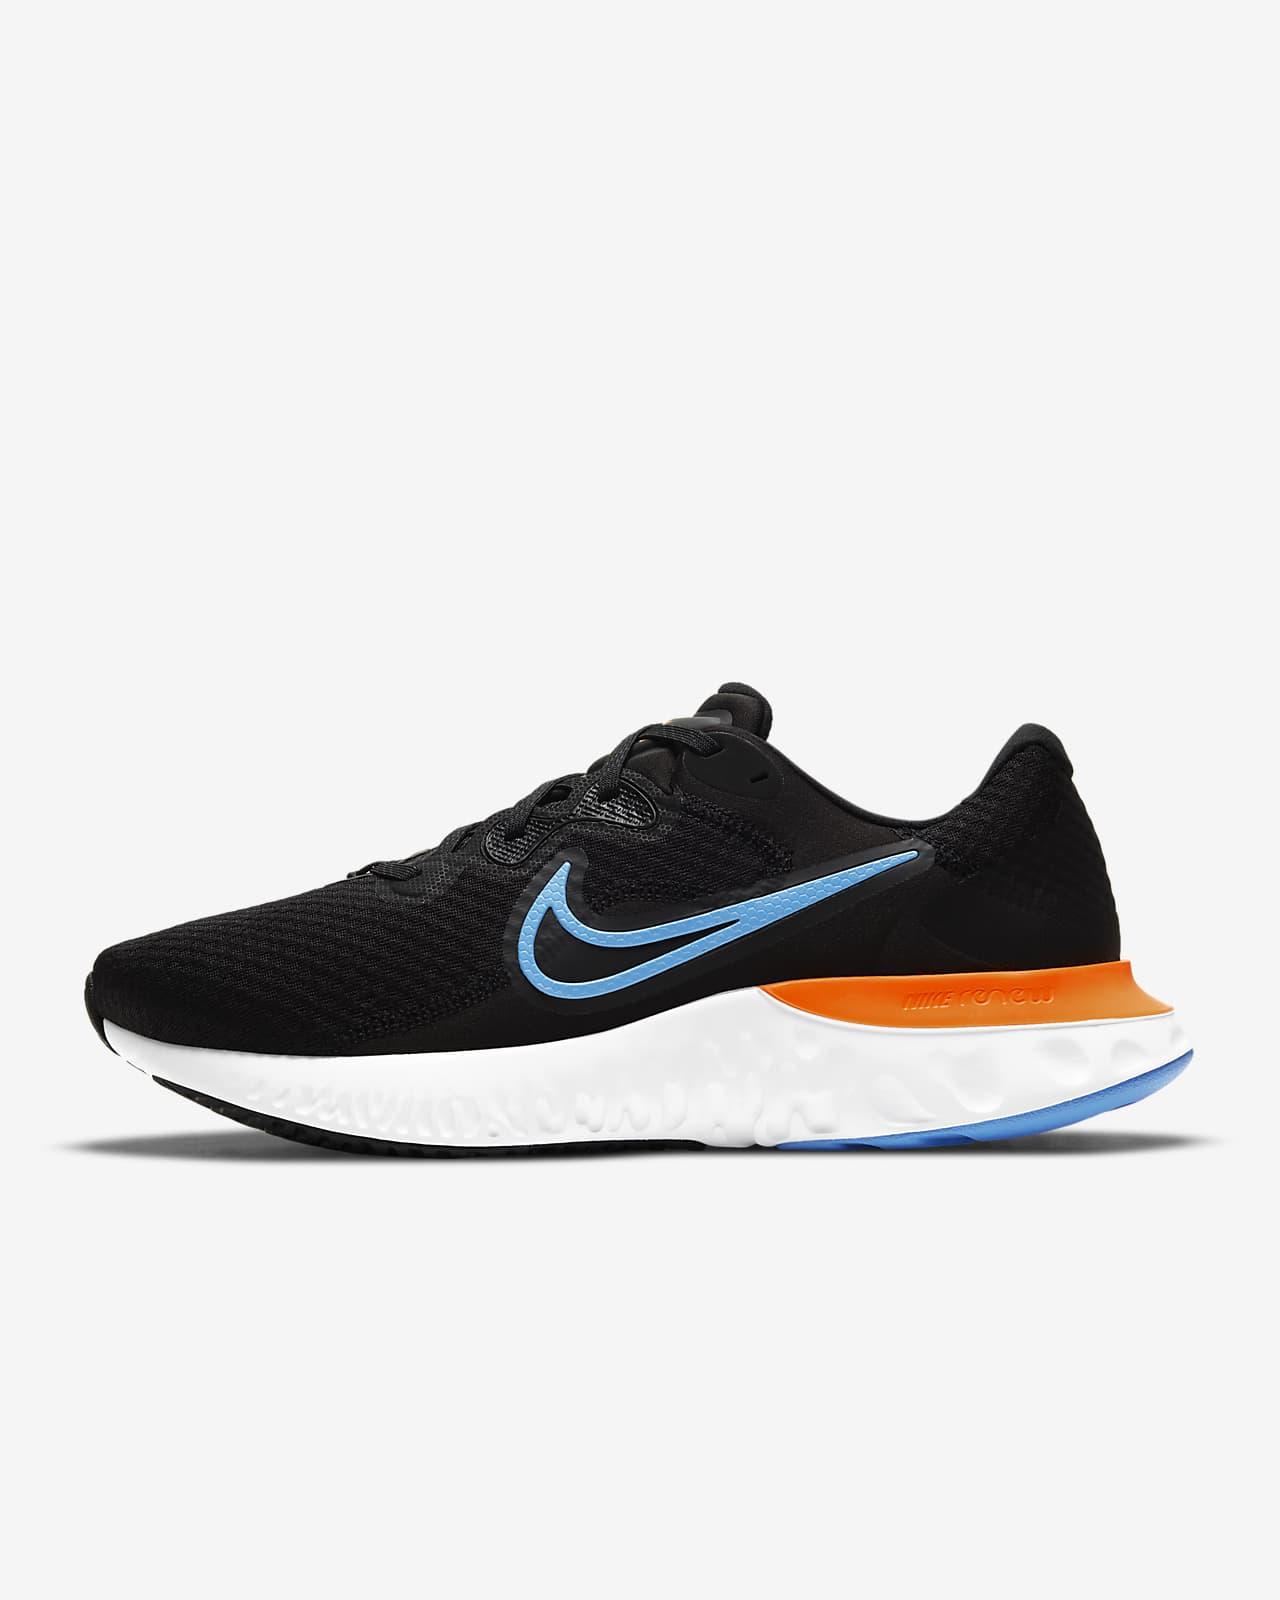 Nike Renew Run 2 Men's Road Running Shoe